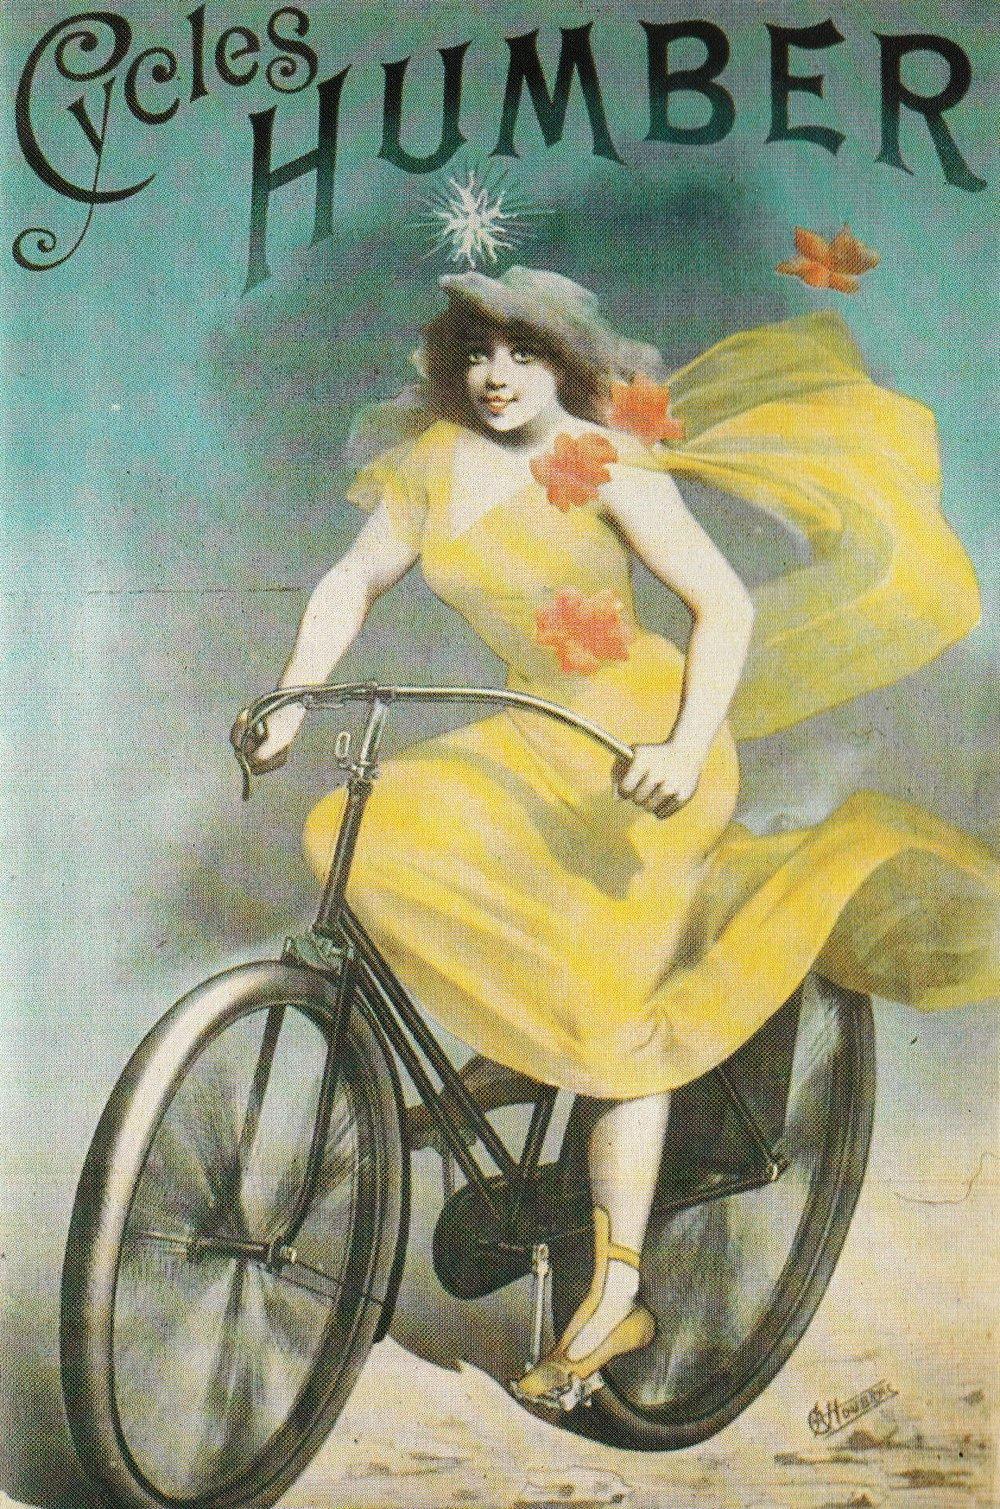 Best of Boneshaker Vintage Poster 6.jpg